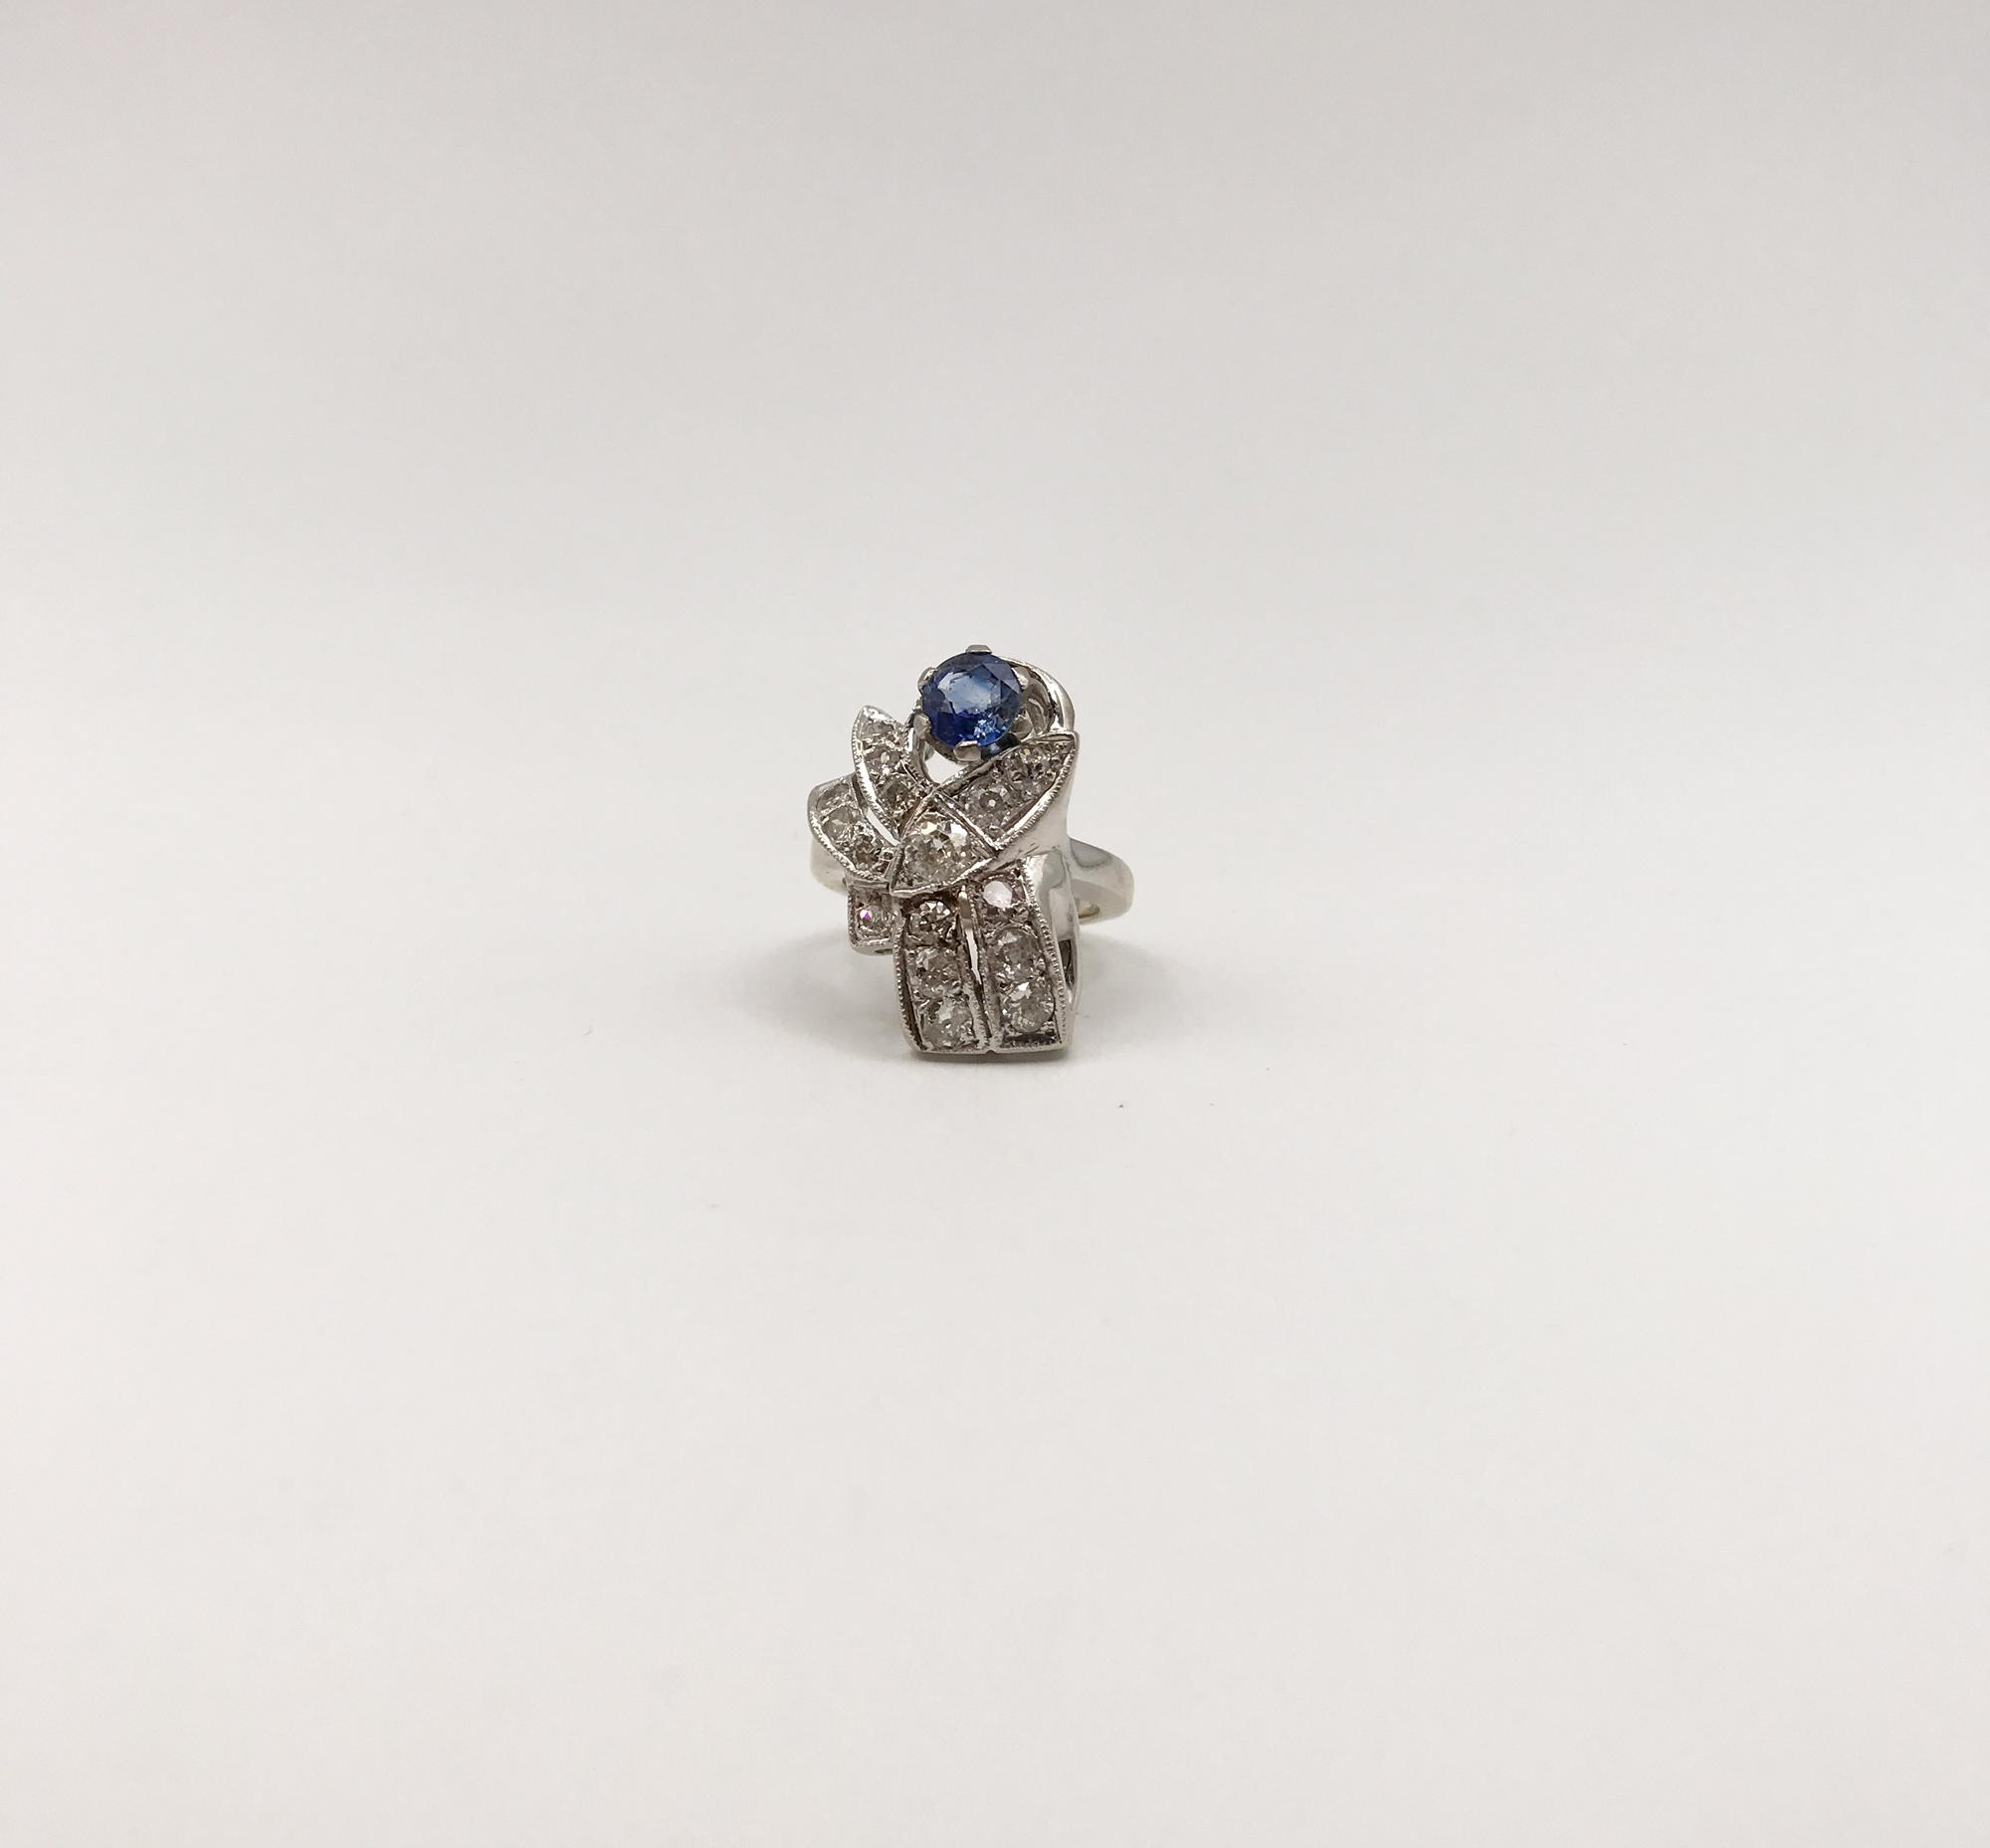 in oro bianco 14kt, zaffiro e diamanti